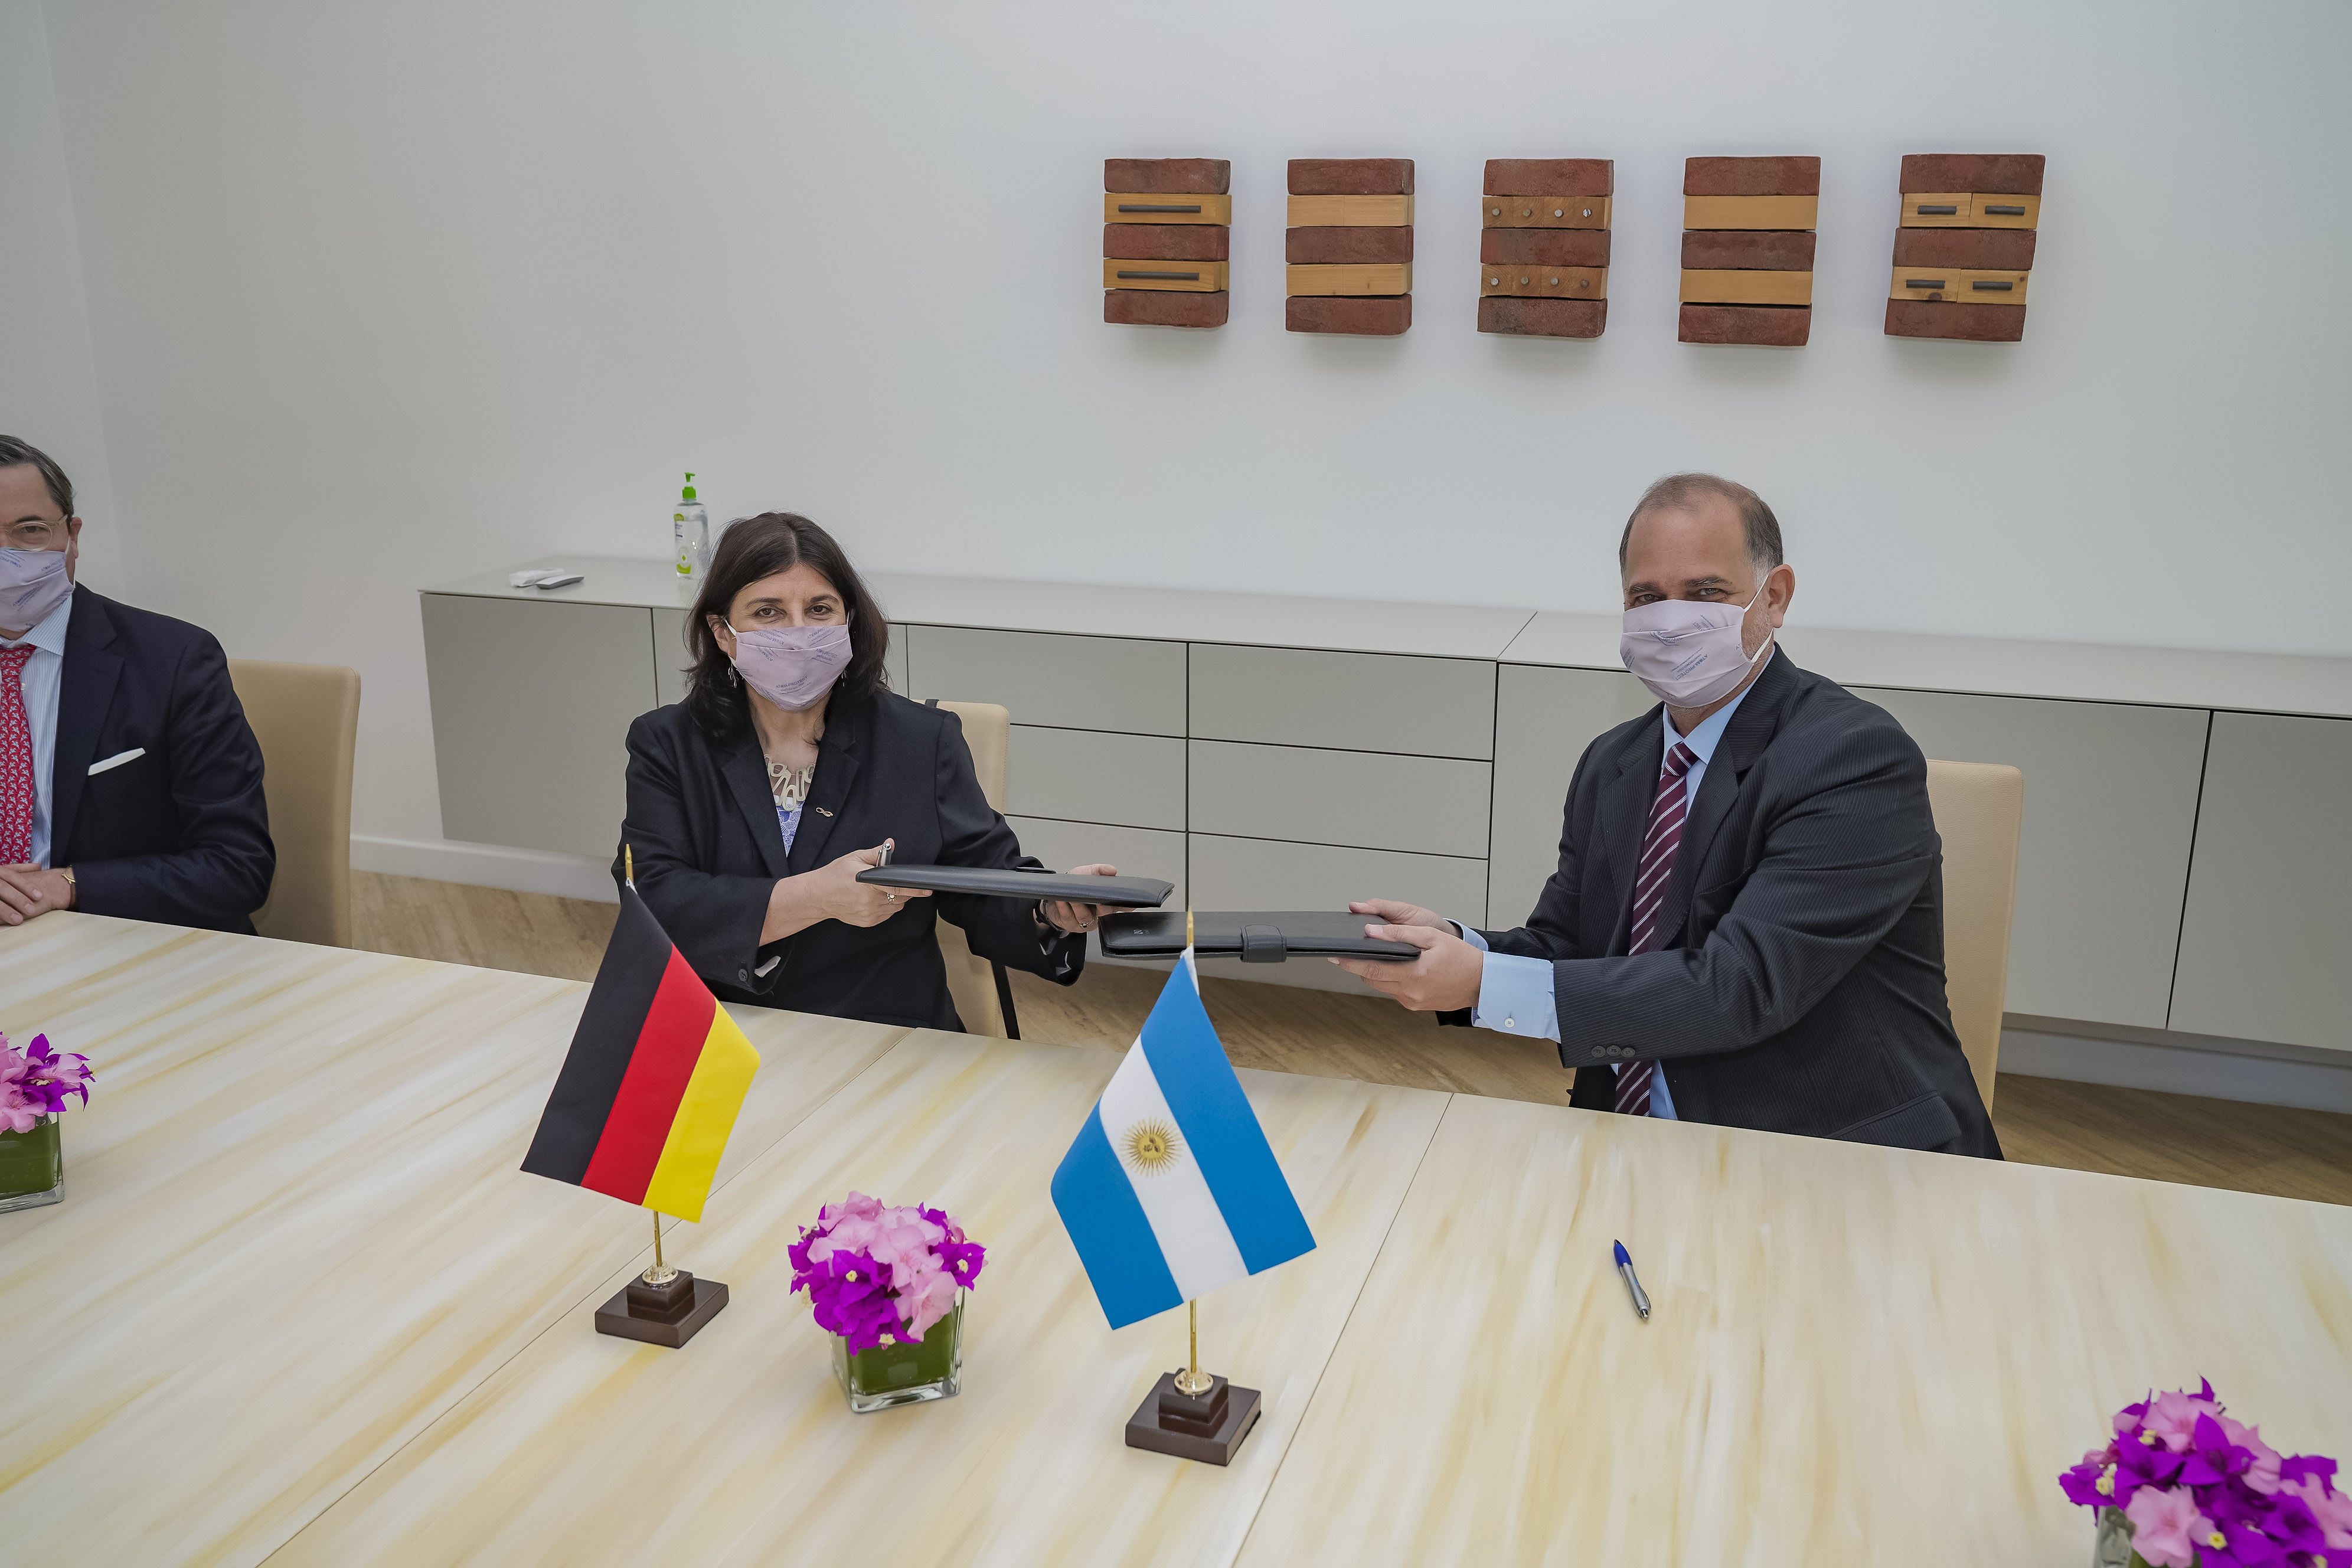 Ana María Franchi y Cristian von Schulz Hausmann